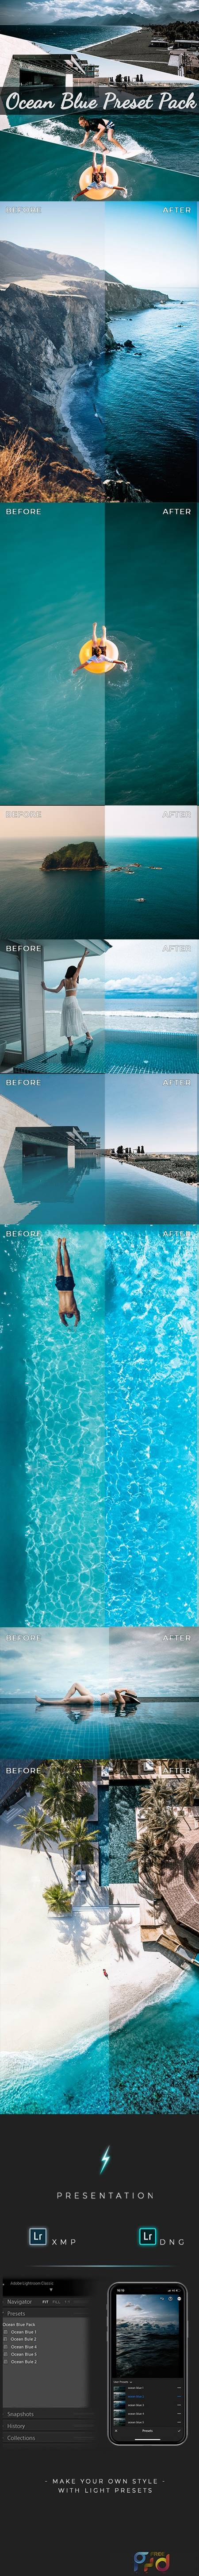 Ocean Blue Preset Pack DELUXE Edition 27976712 1